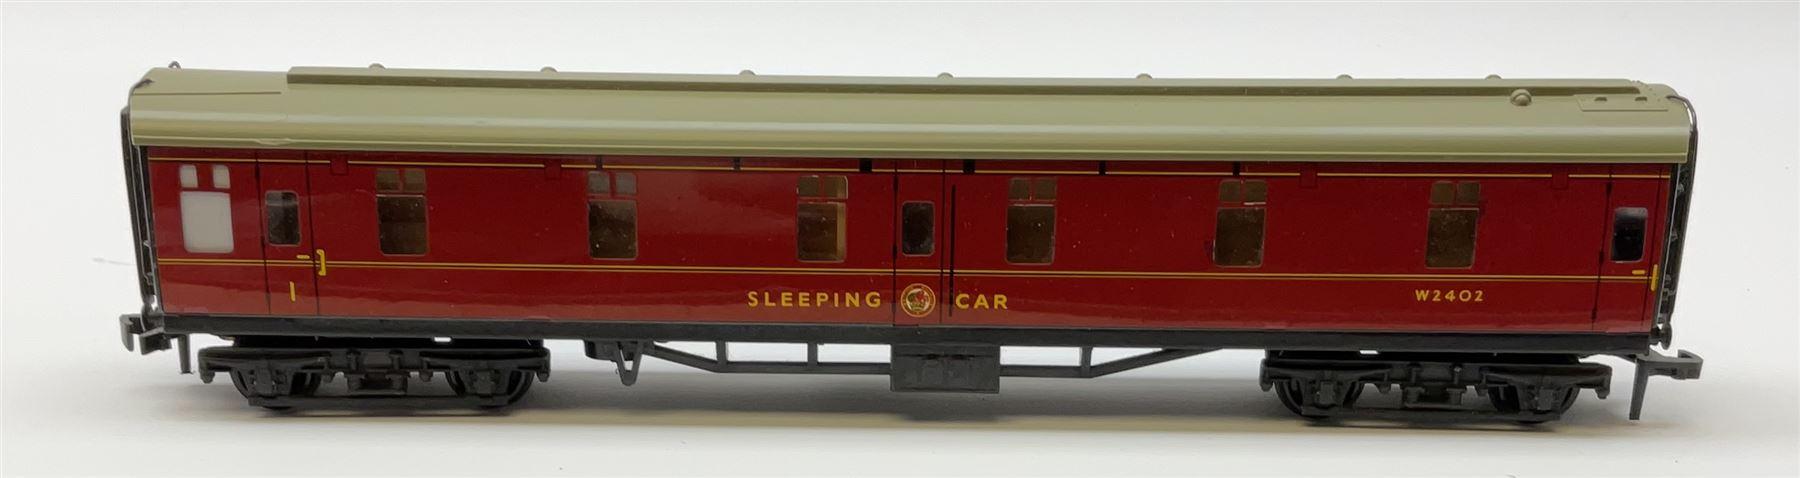 Hornby Dublo - 4075 Passenger Brake Van B.R.; 4078 Composite Sleeping Car B.R.; 4082 Suburban Coach - Image 3 of 5